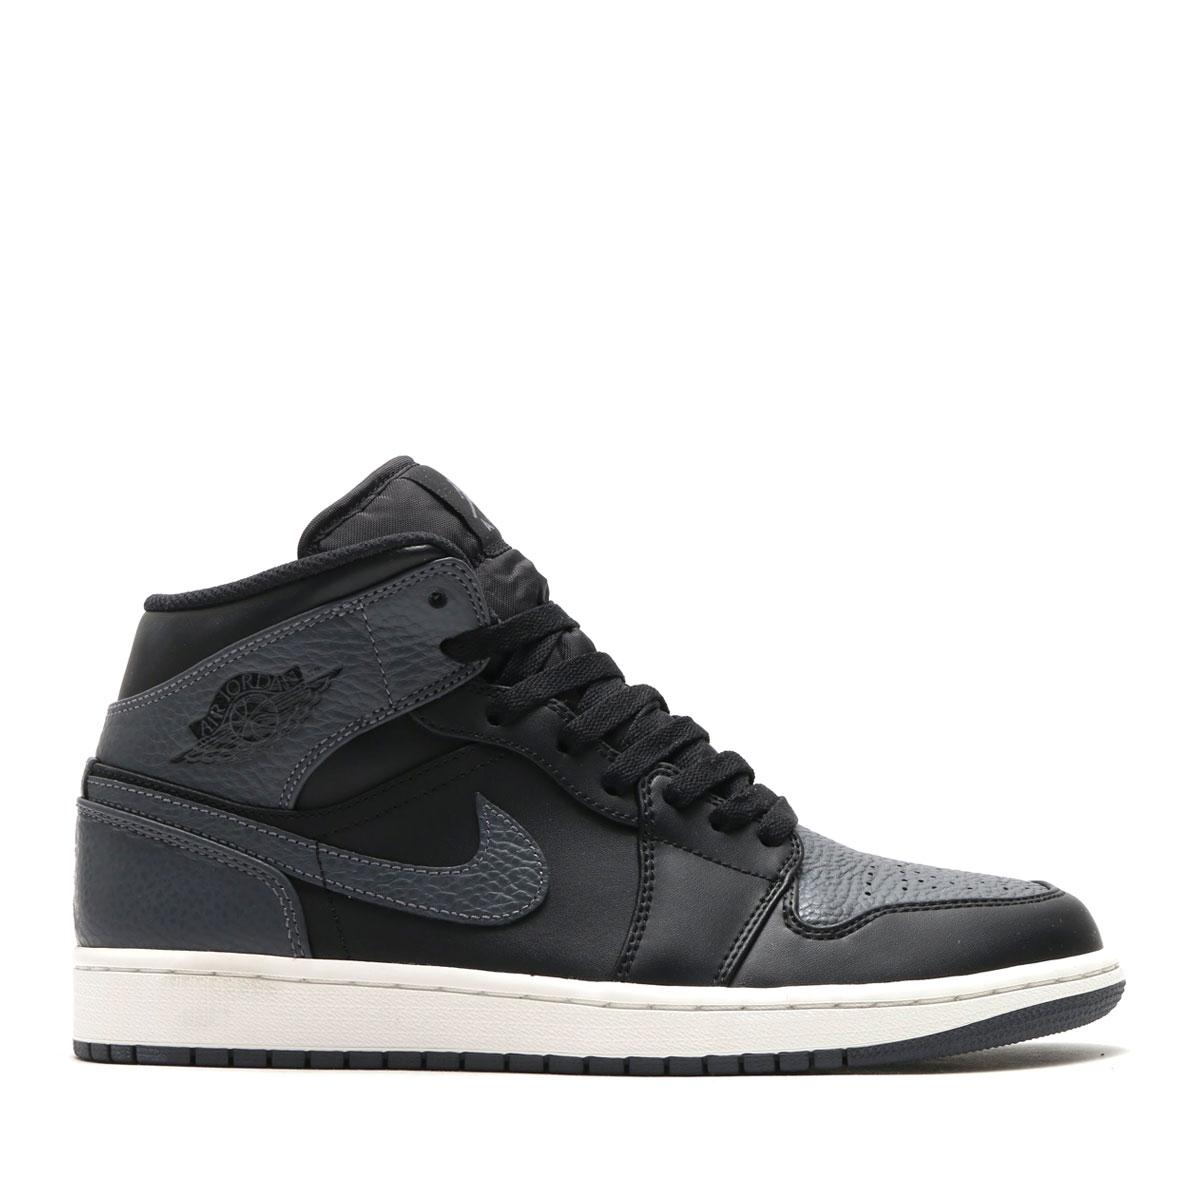 95d780cee00 NIKE AIR JORDAN 1 MID (Nike Air Jordan 1 mid) BLACK DARK GREY-SUMMIT WHITE  18SP-I